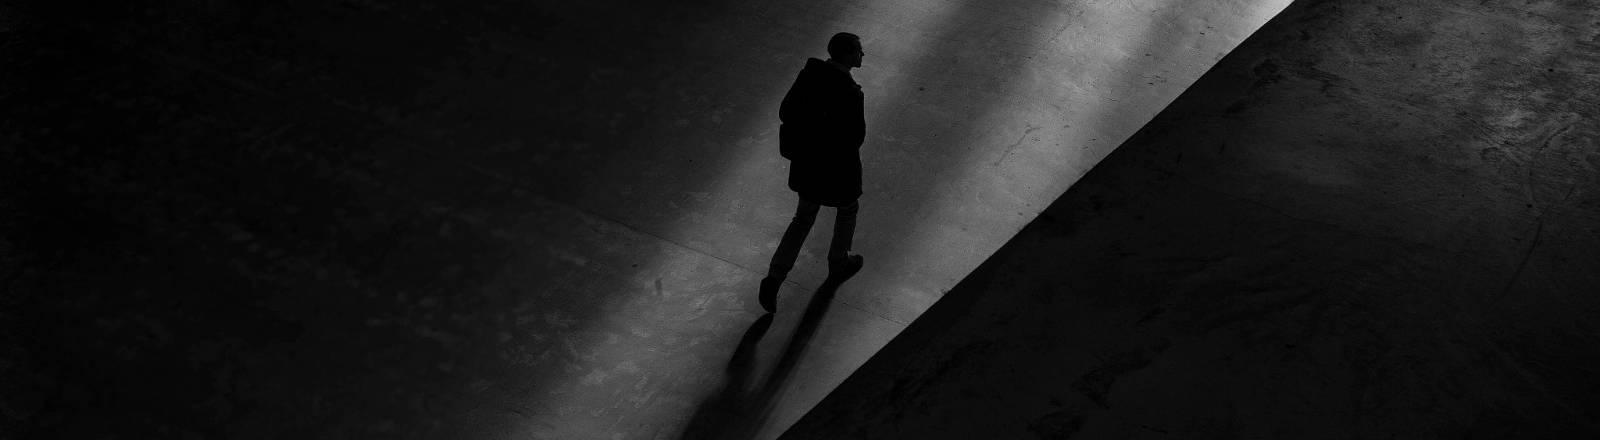 Ein Mann geht einen Weg entlang